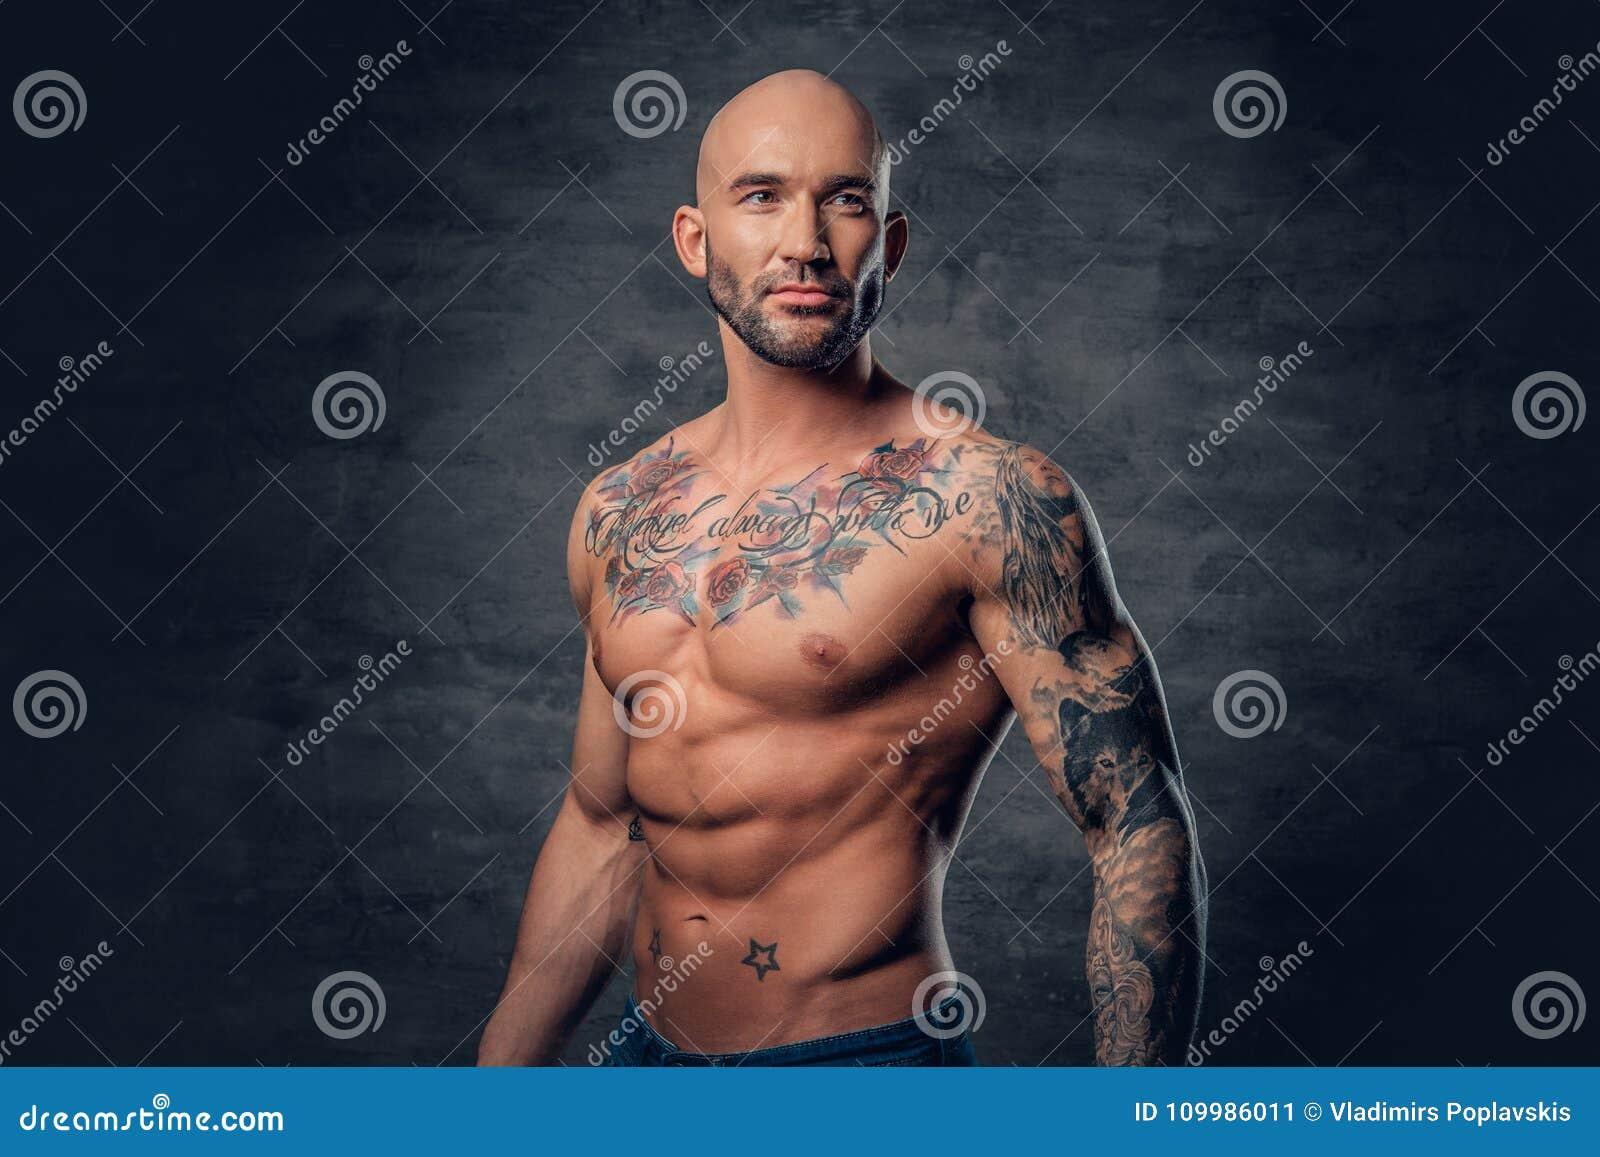 Male Principal Rase Sportif Avec Des Tatouages Sur Son Torse Posant